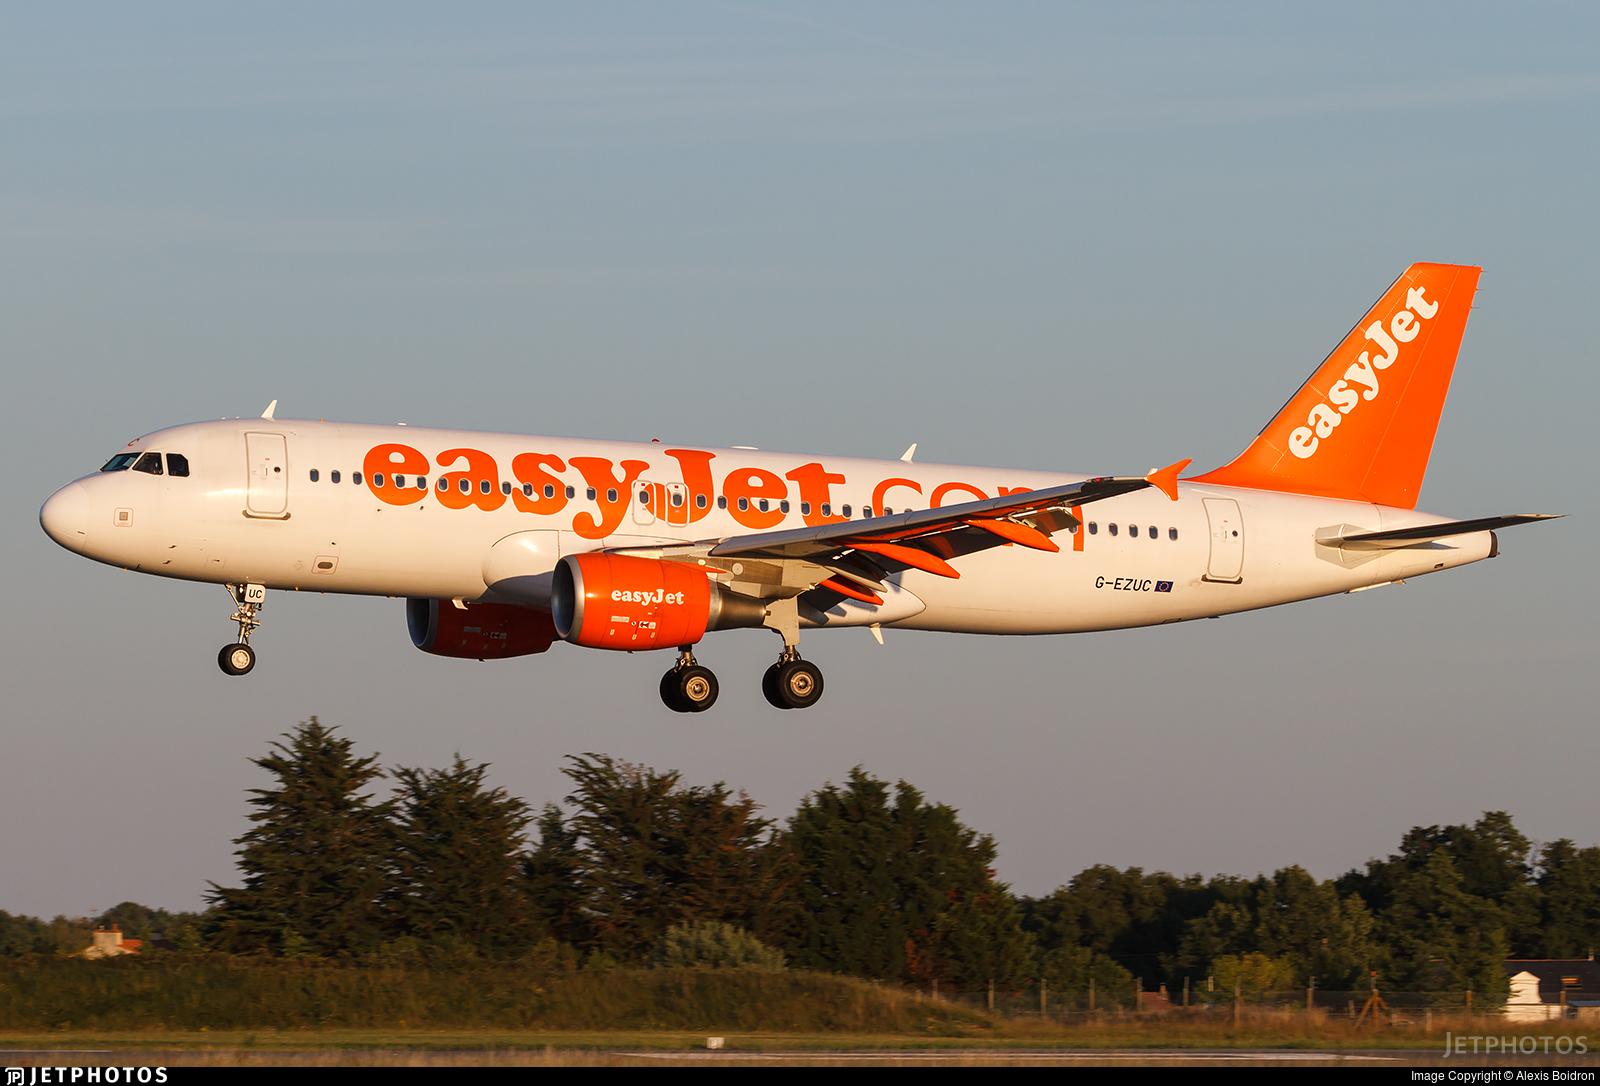 G-EZUC - Airbus A320-214 - easyJet